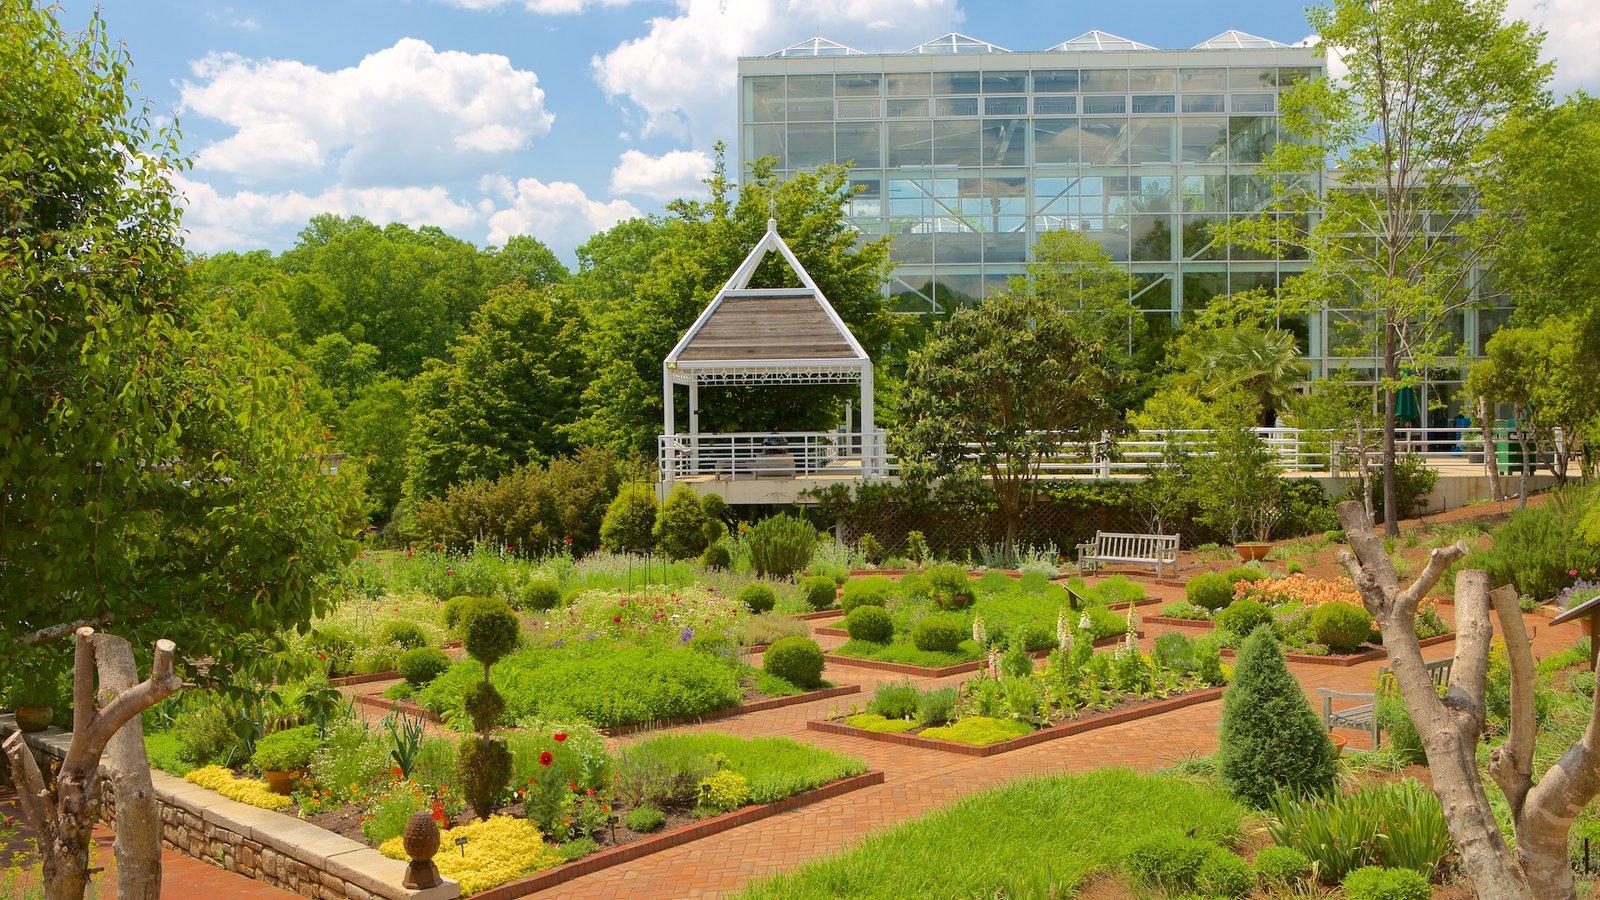 Attirant State Botanical Garden Of Georgia Which Includes A Garden